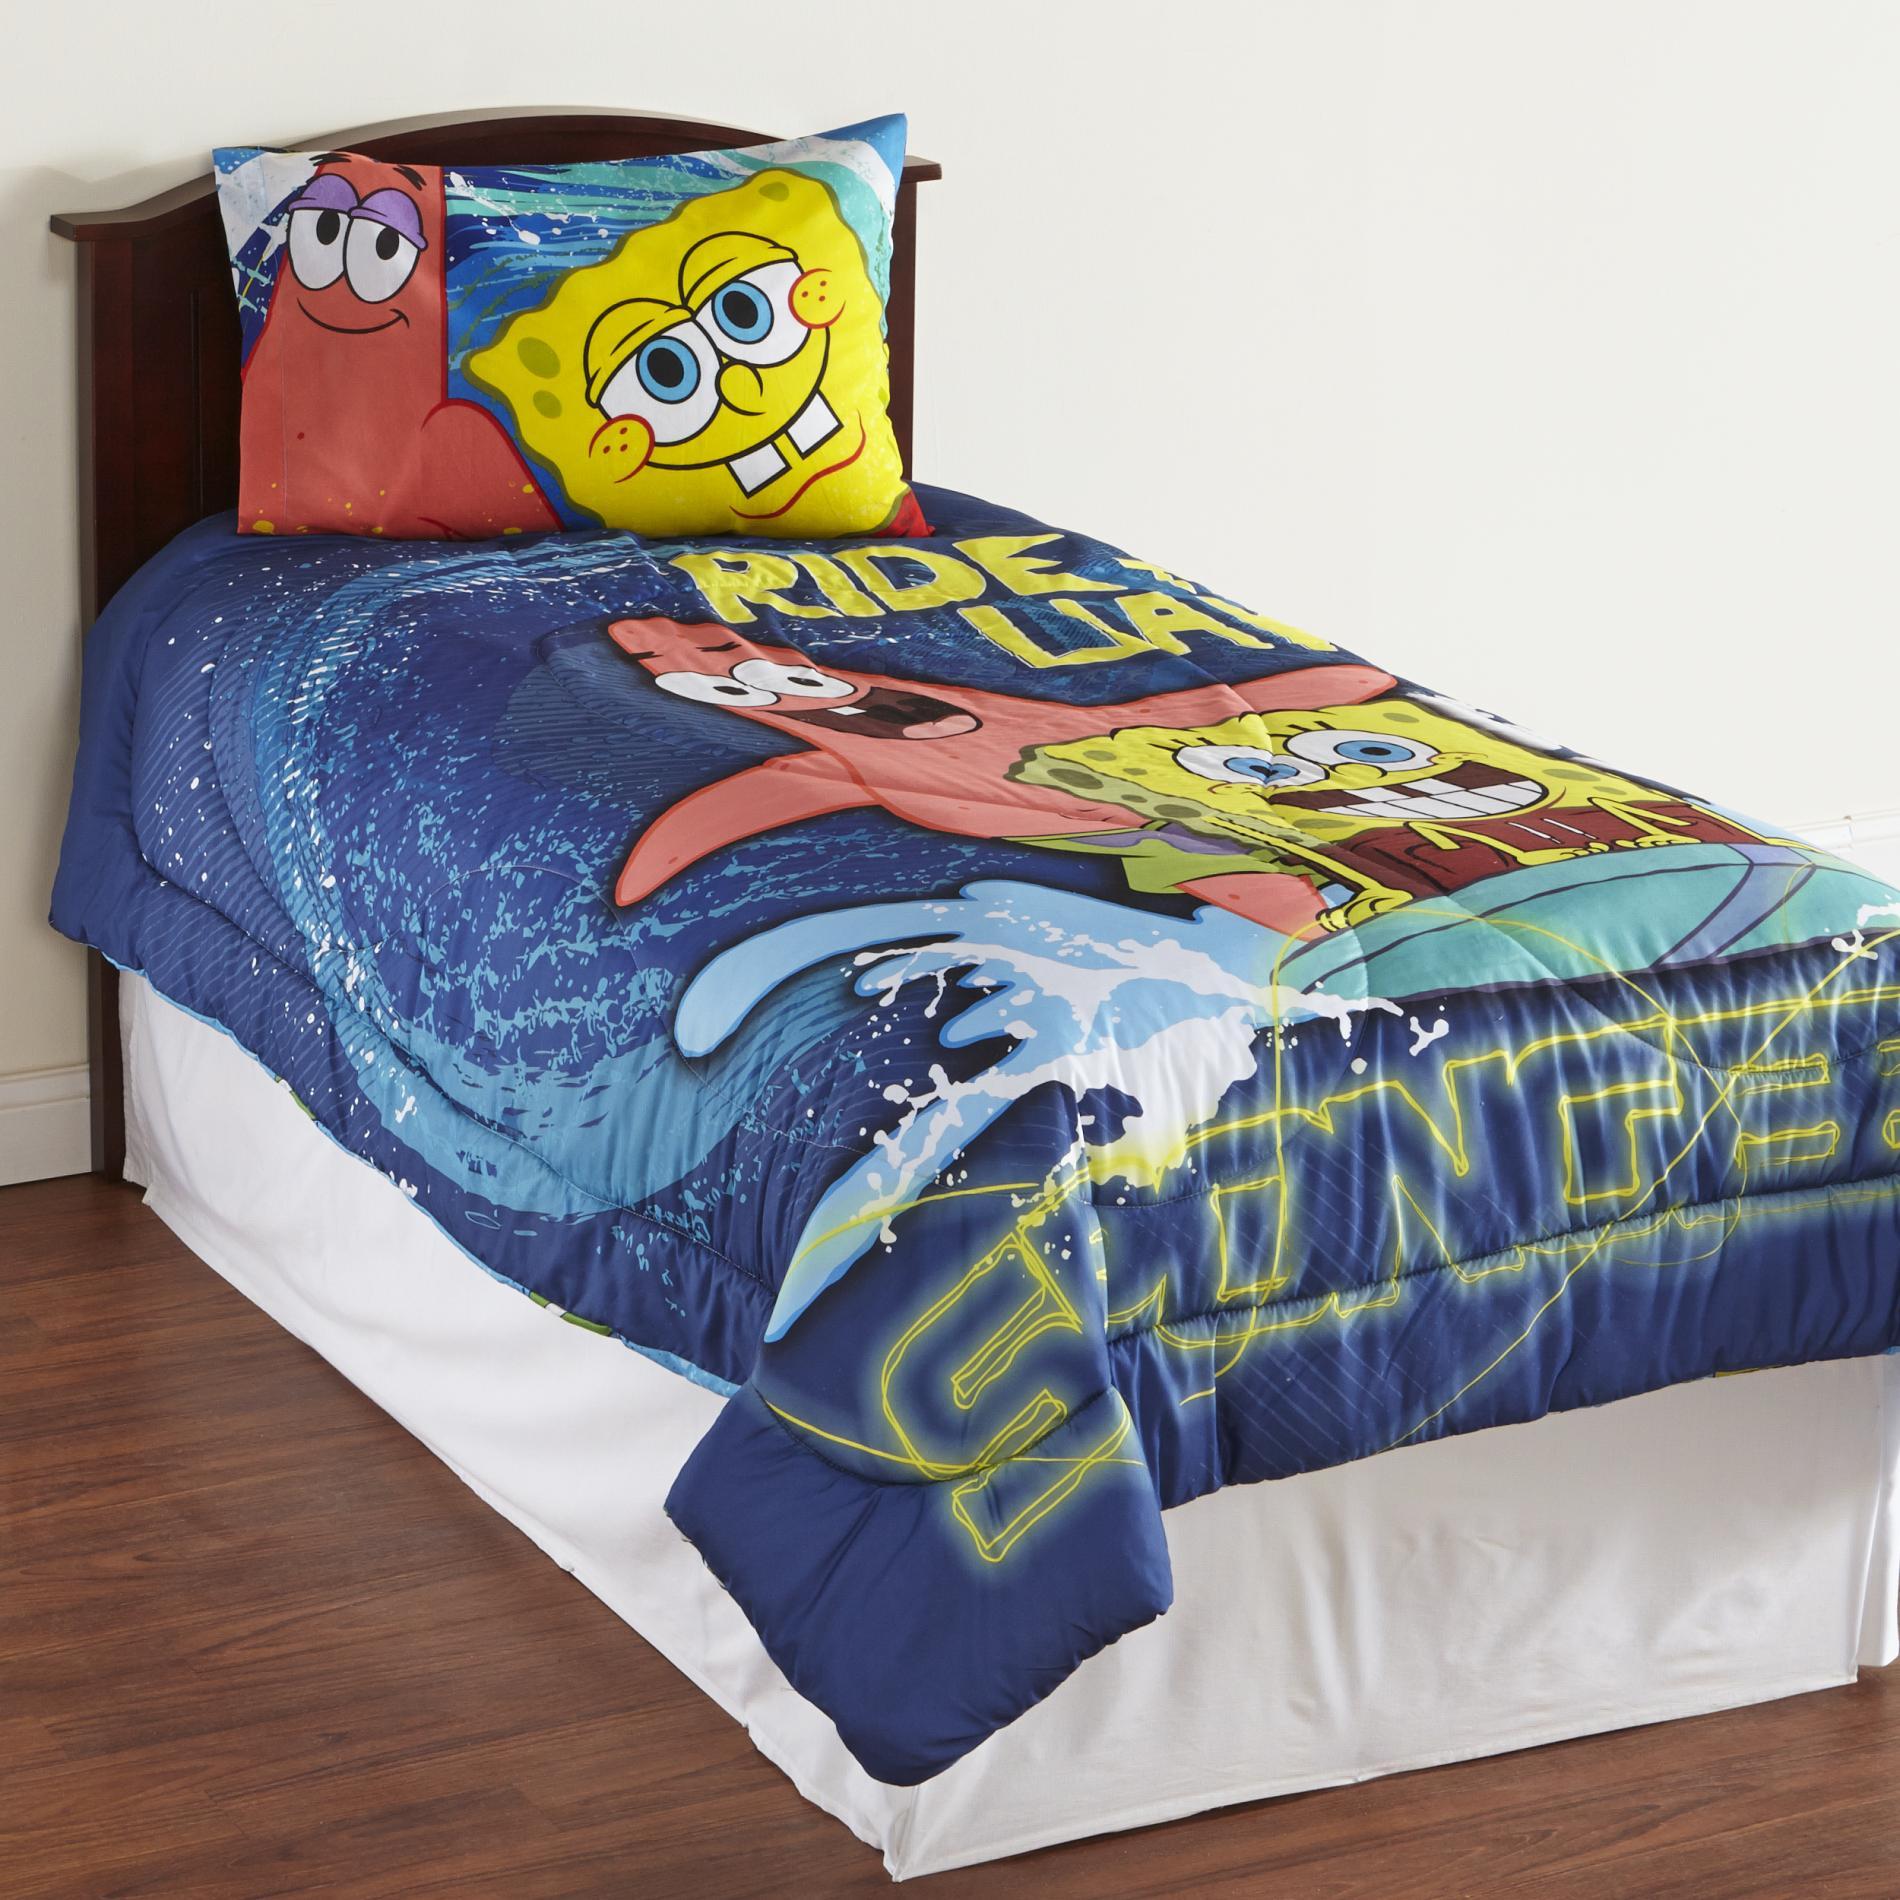 Nickelodeon Boy' Microfiber Comforter - Spongebob Squarepants